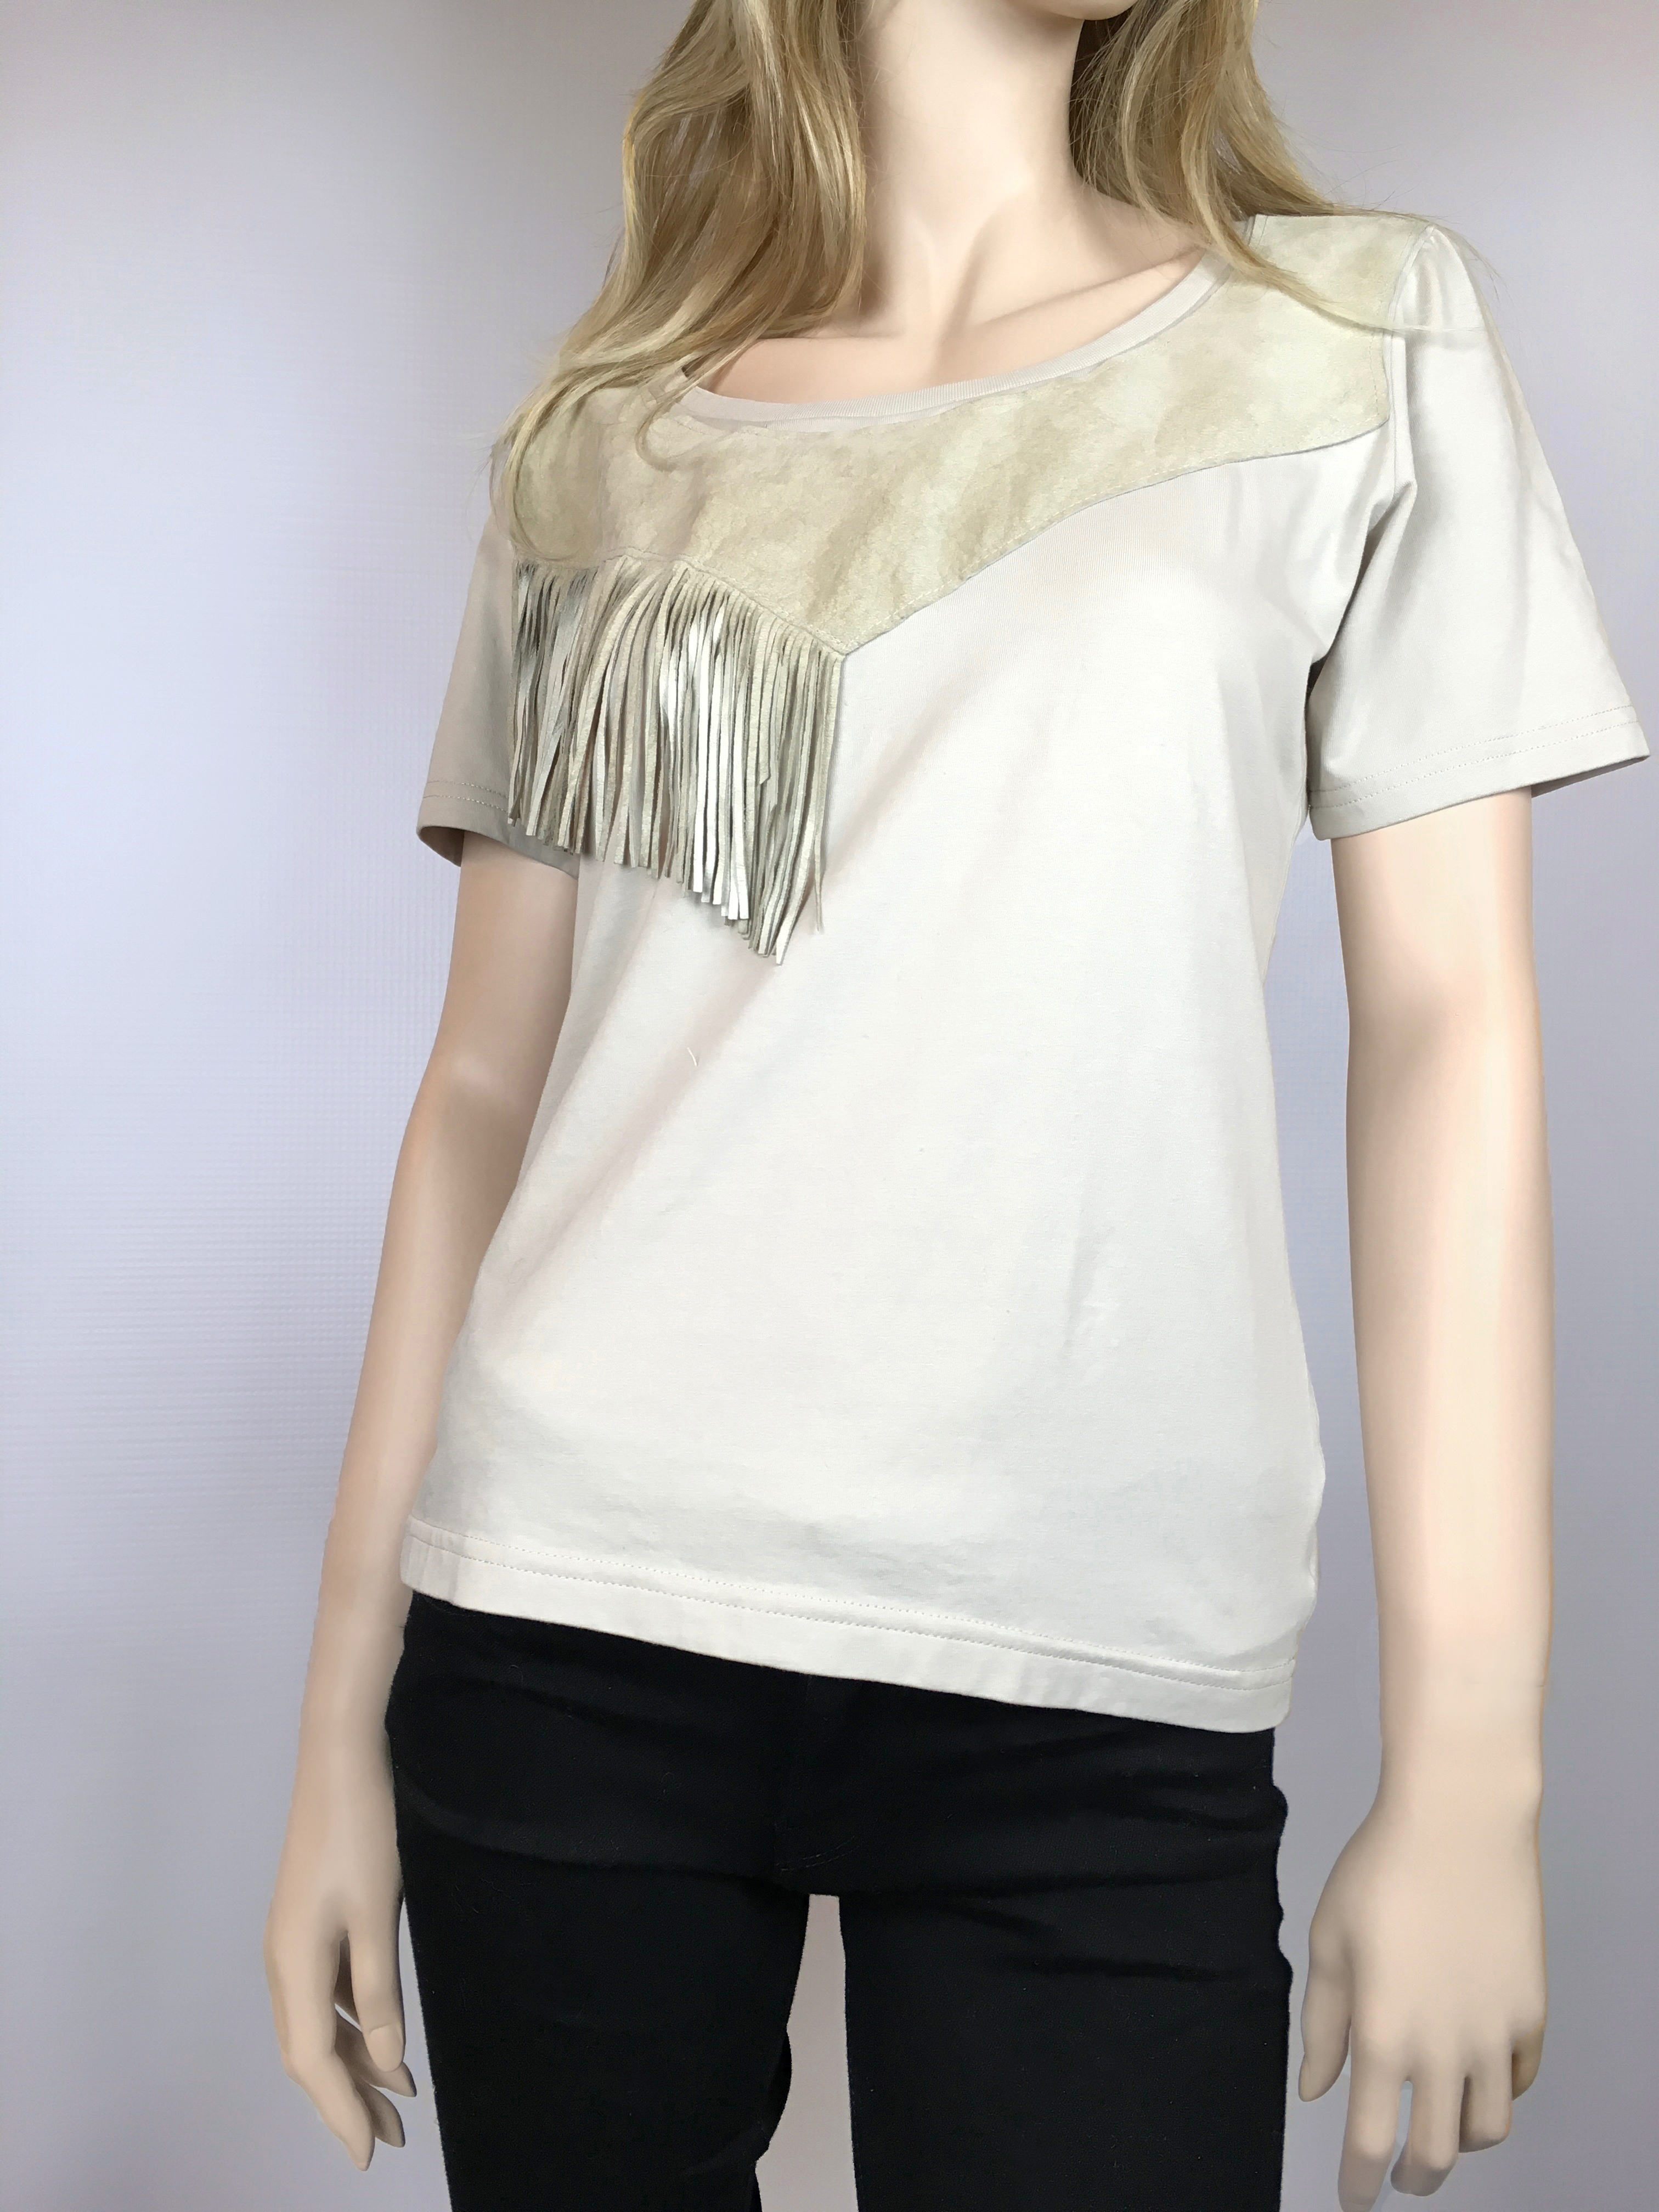 MILOVA 2017 T-shirt plastron cuir